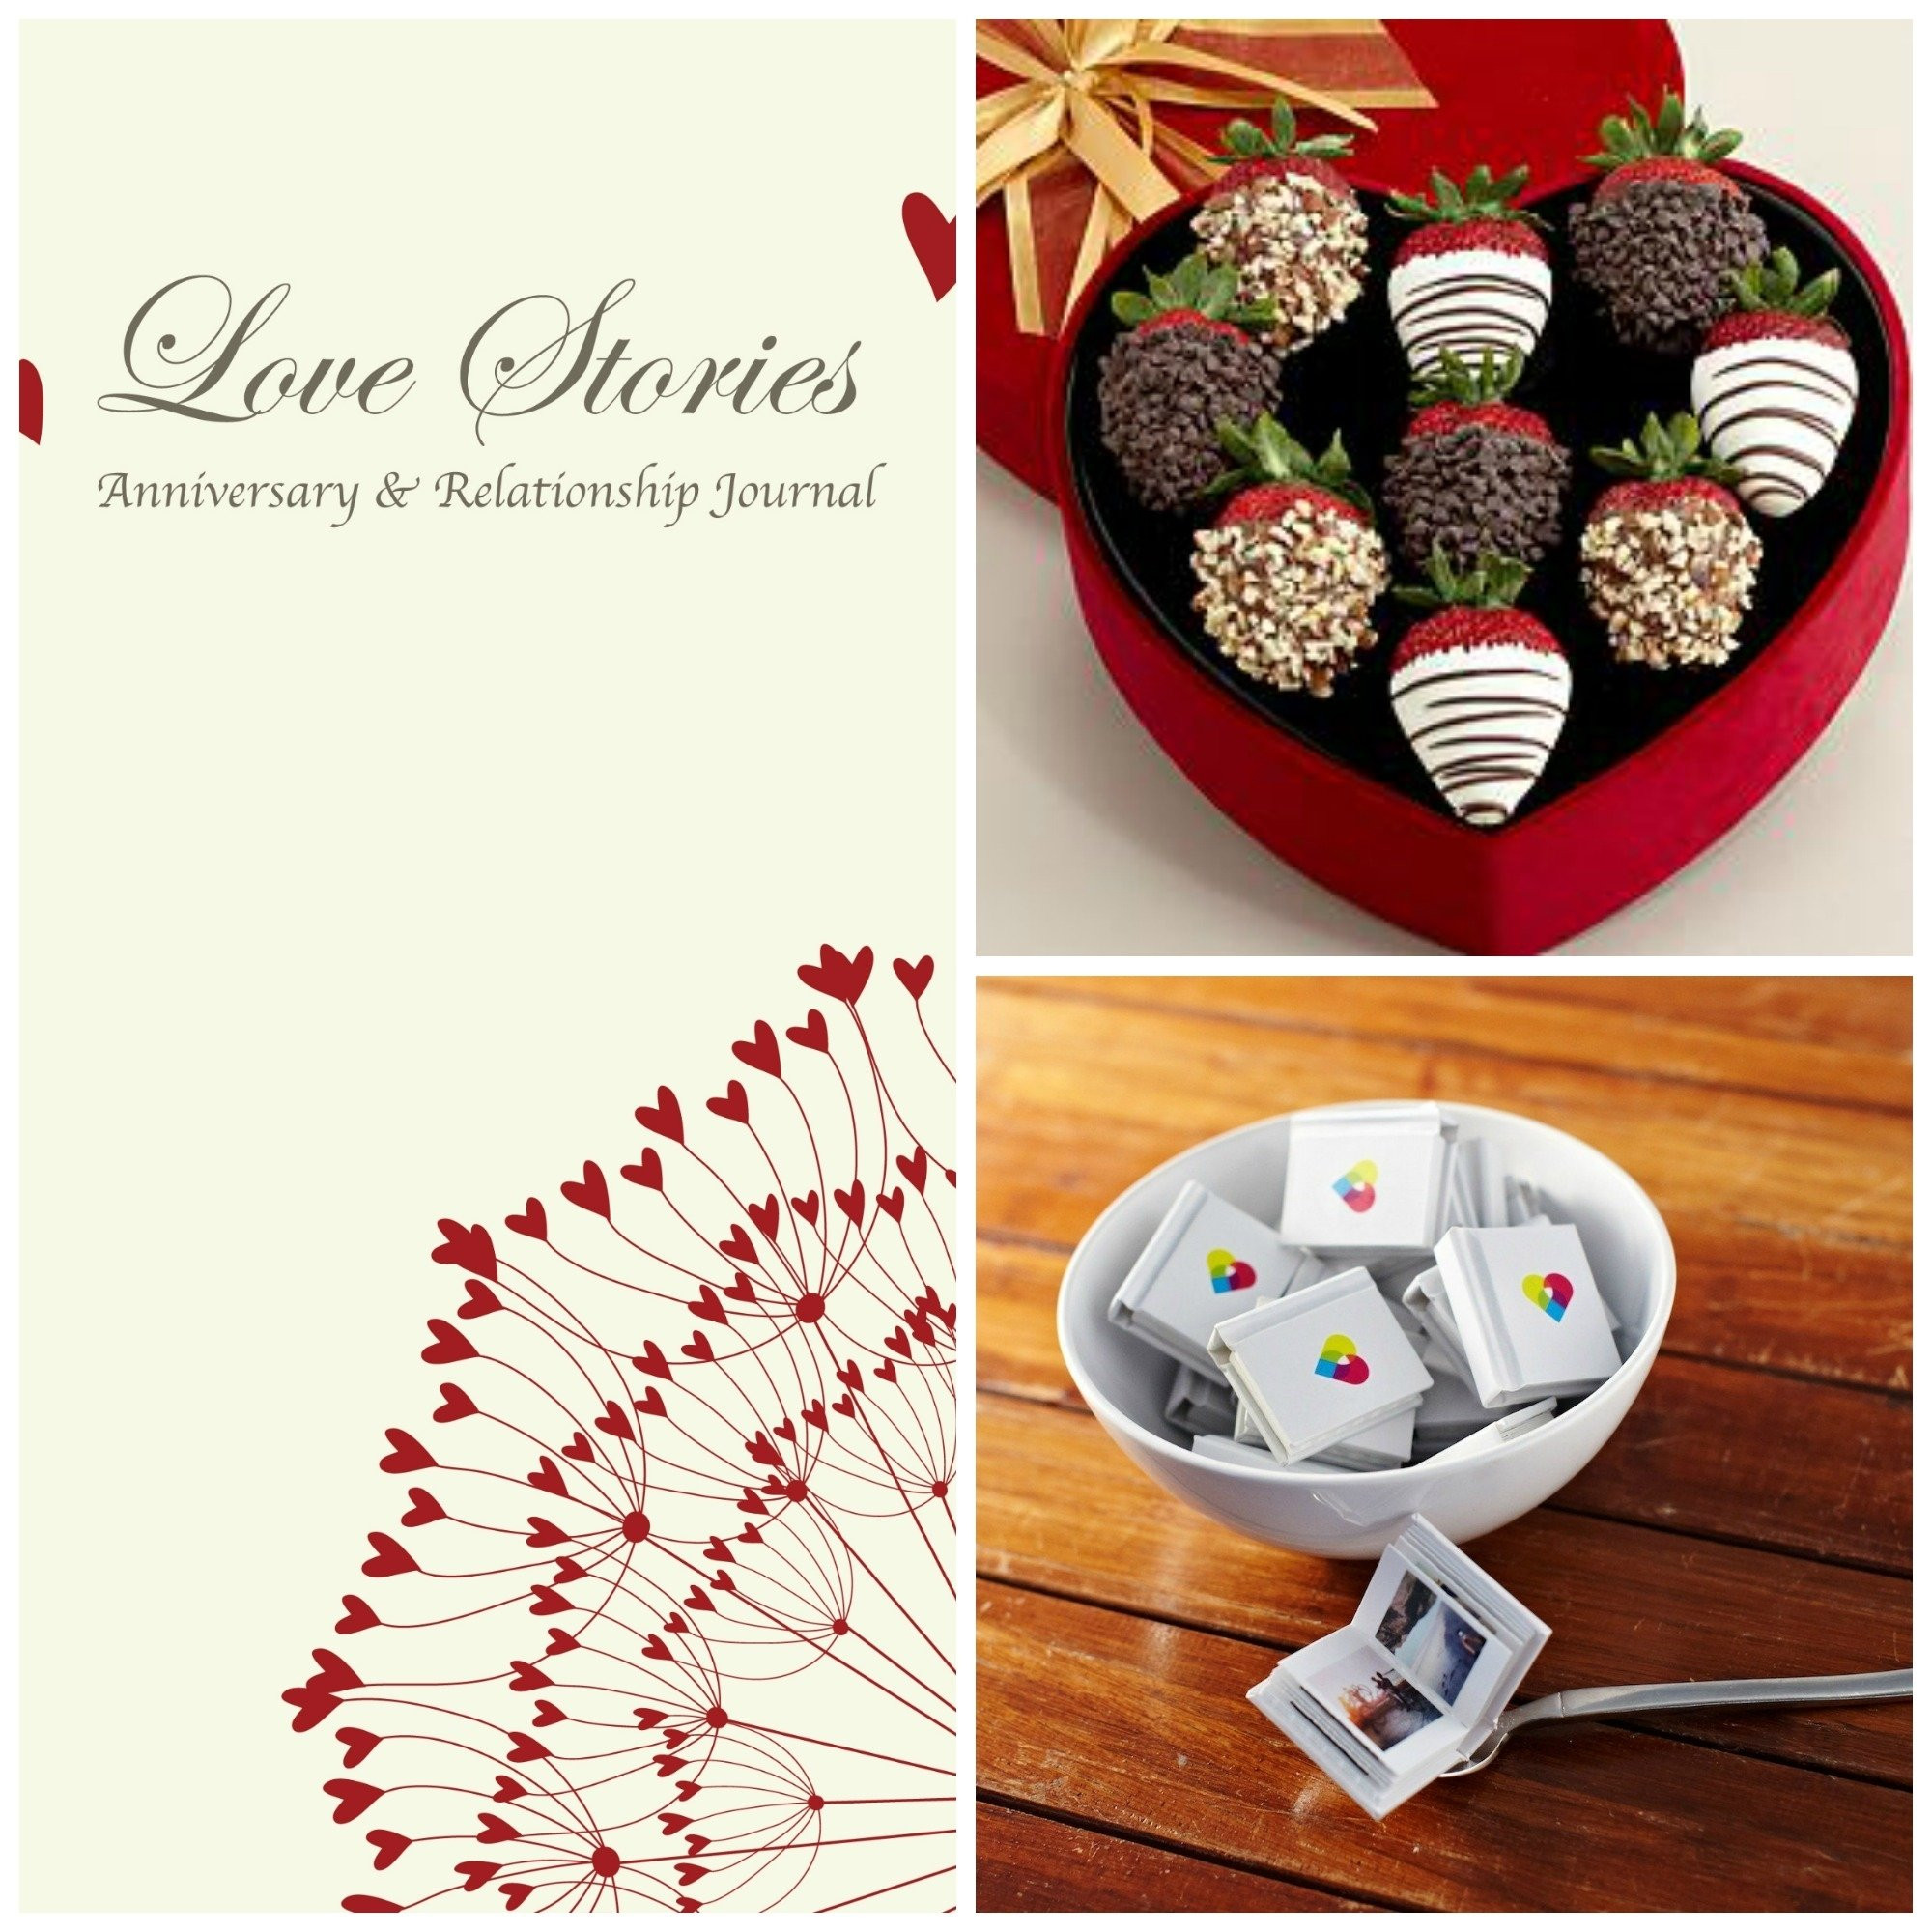 Romantic Birthday Gift Ideas For Him  10 Lovable Romantic Birthday Gift Ideas Boyfriend 2020